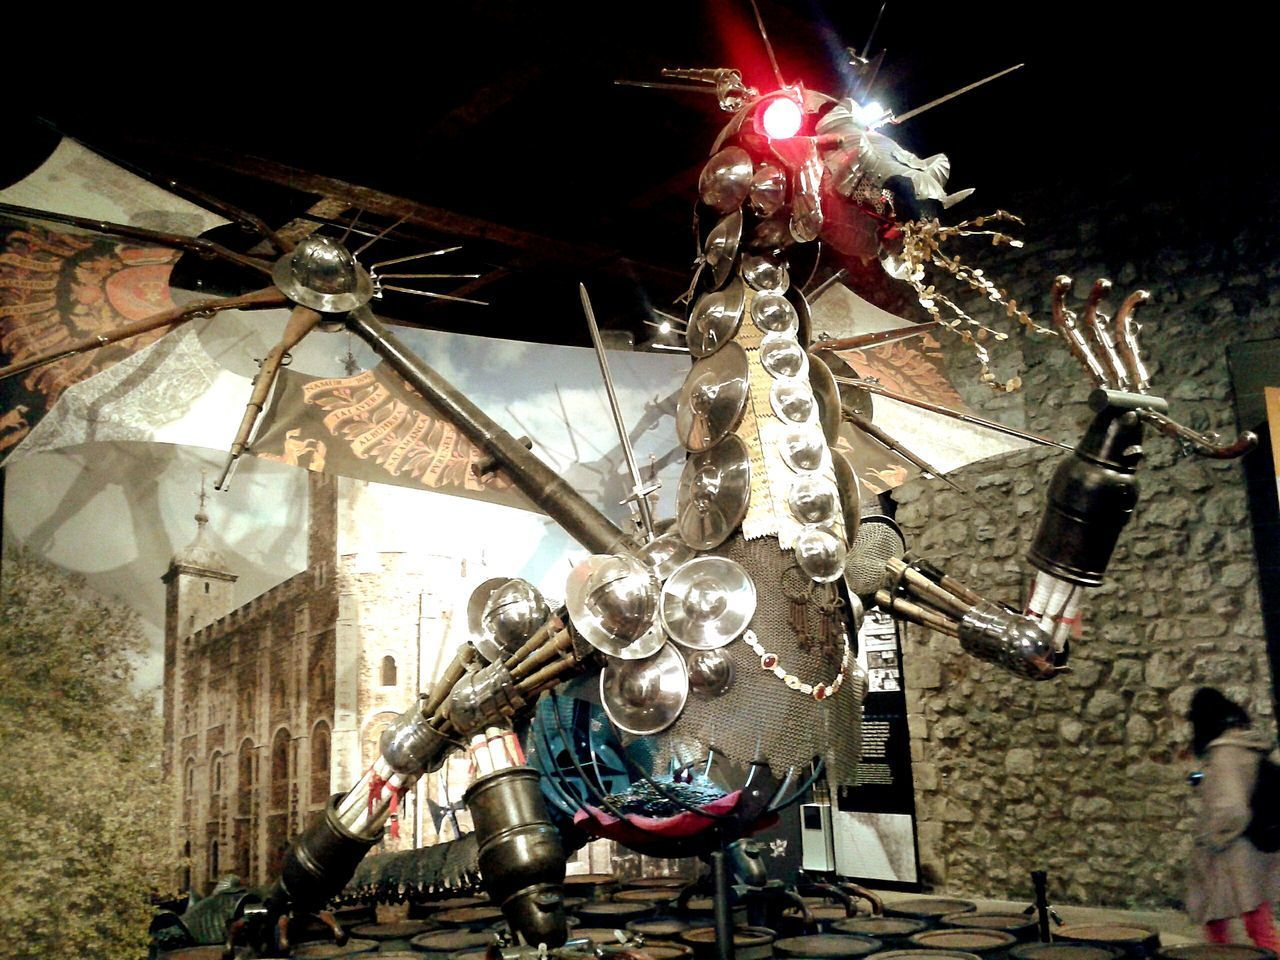 Arts Culture And Entertainment Dragon Armor Armour Shield Helmet